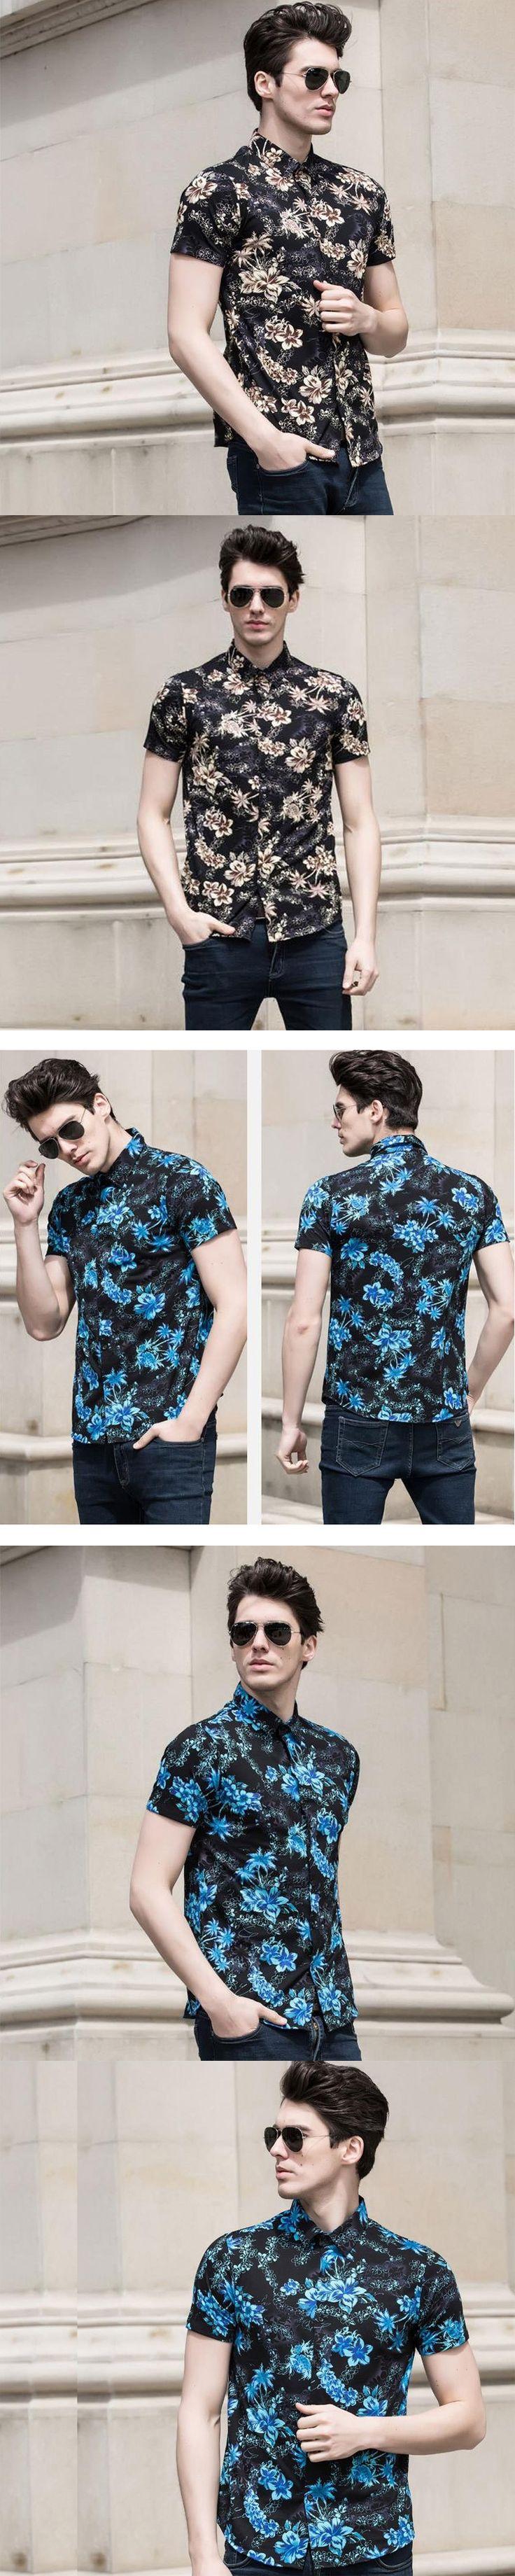 New classic design palm trees men's hawaiian flowers printing summer dress shirt